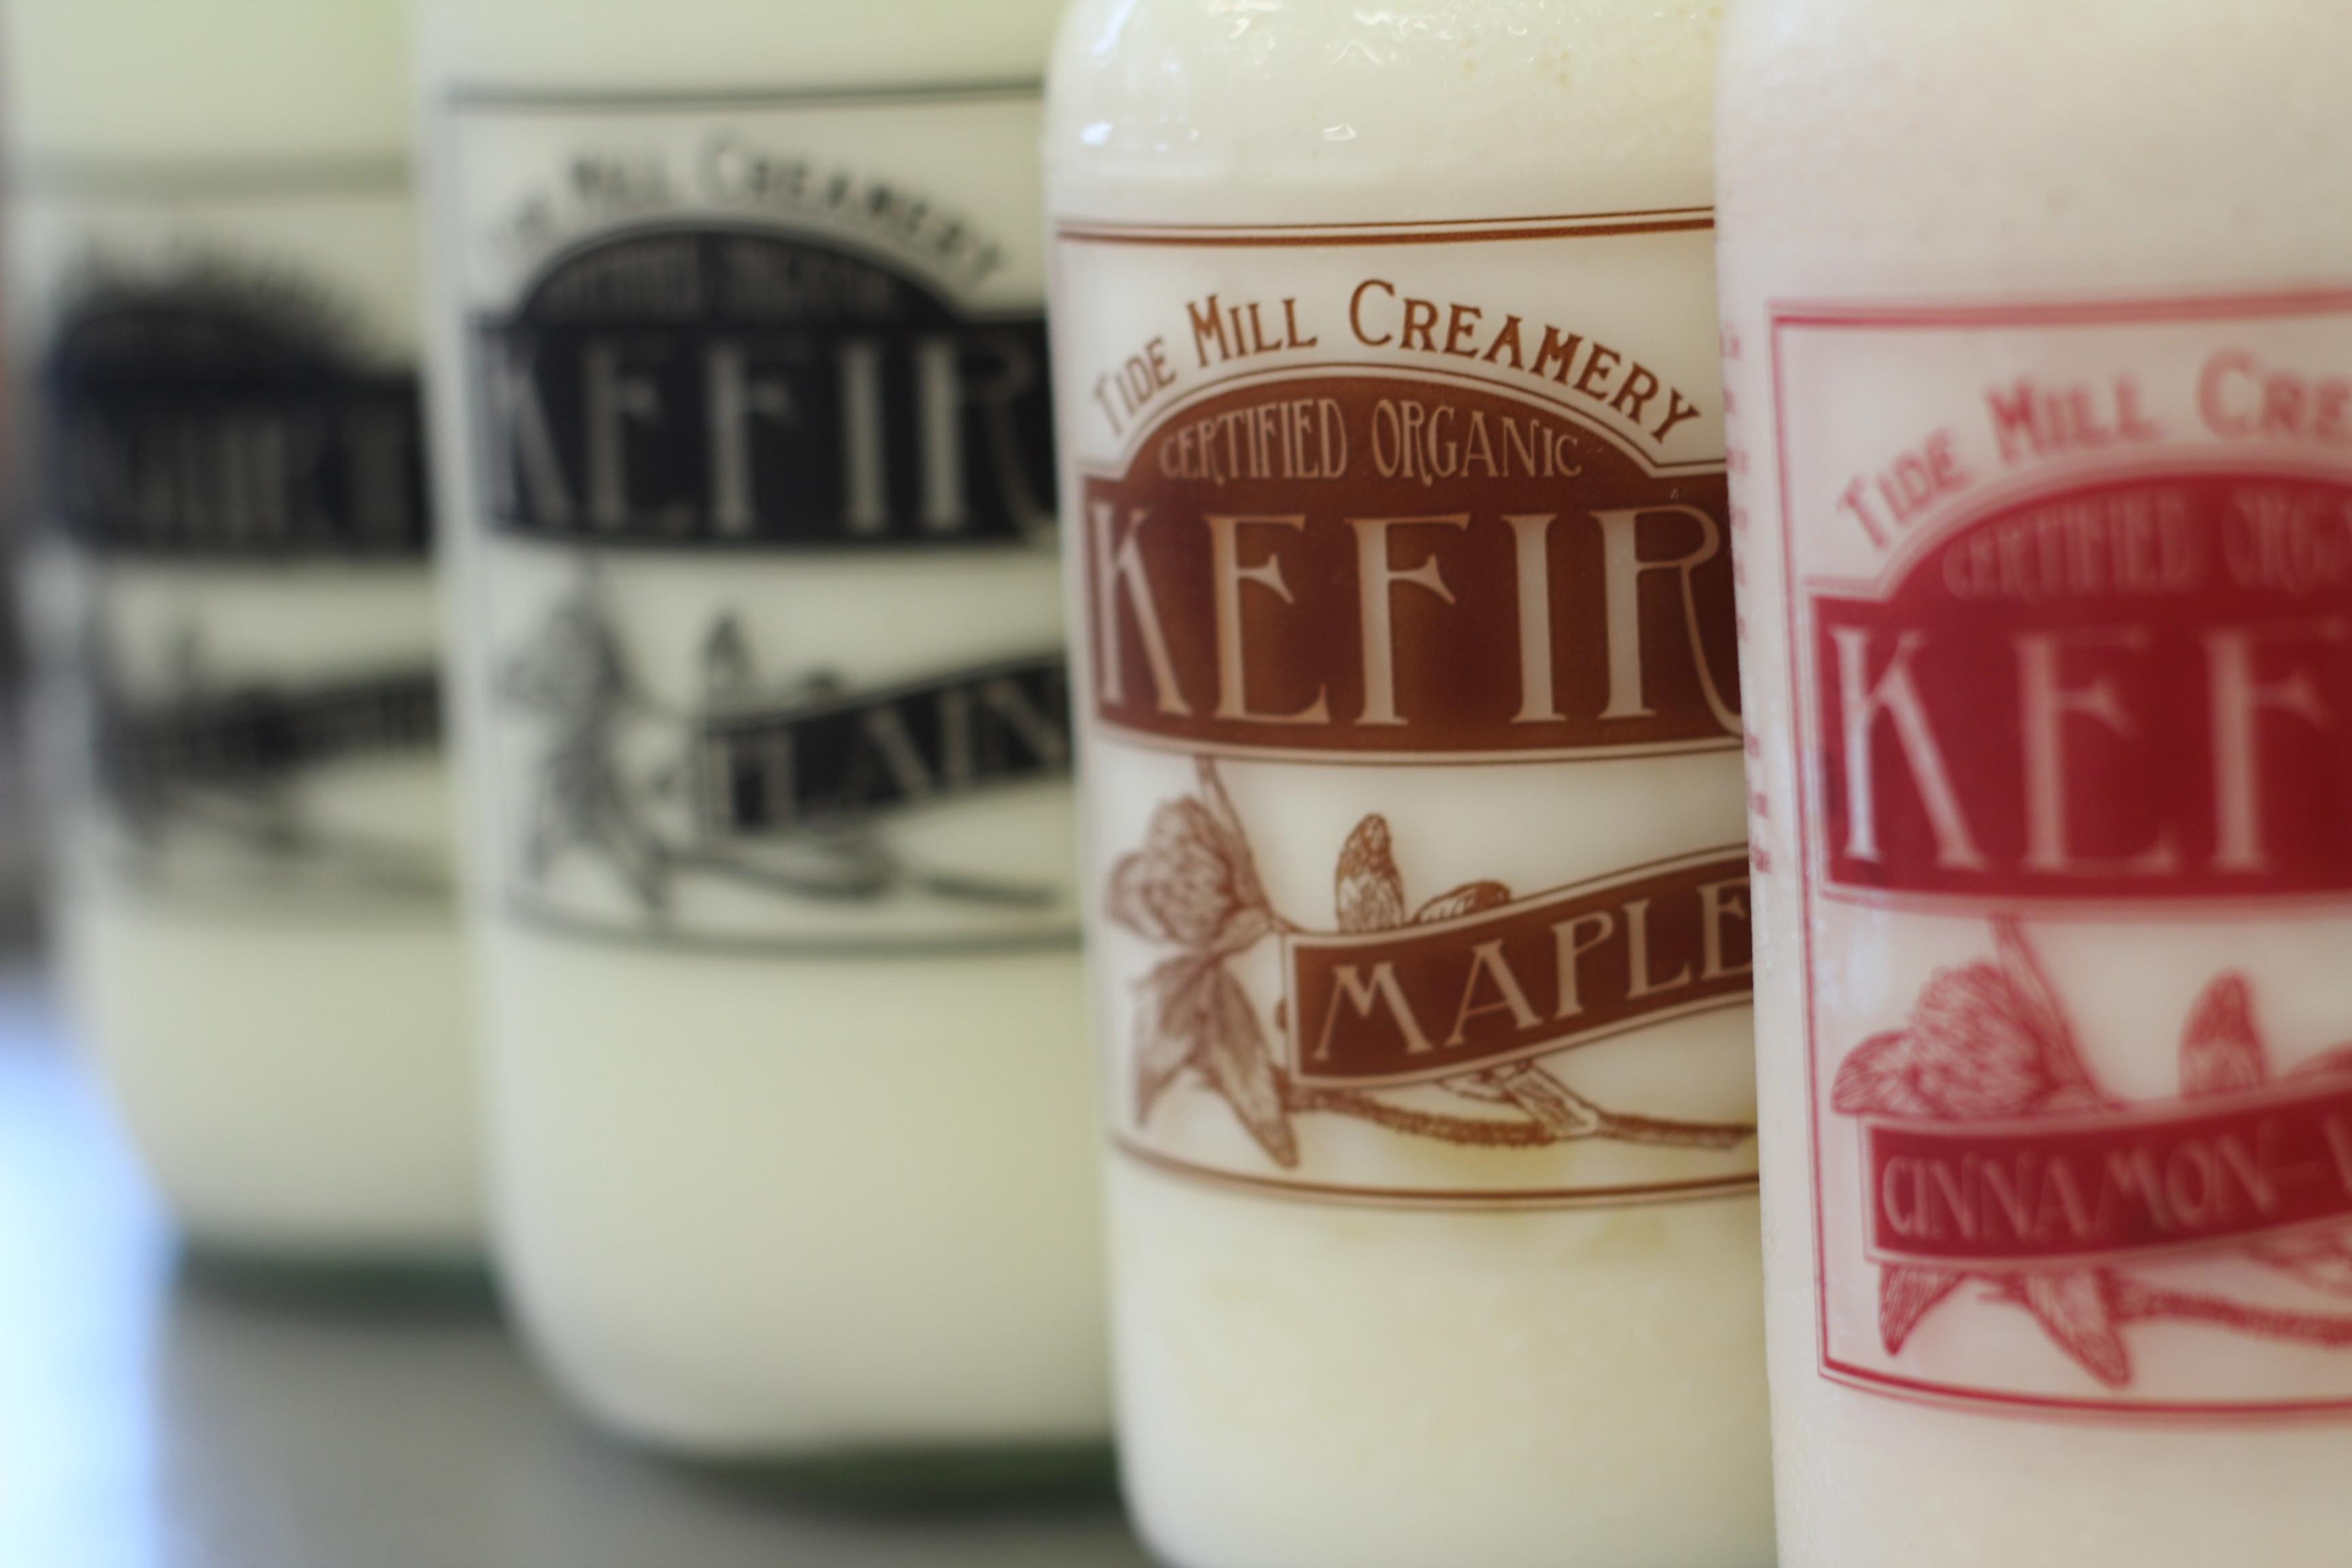 Cheese Yogurt Kefir Amp Raw Goat S Milk Tide Mill Creamery